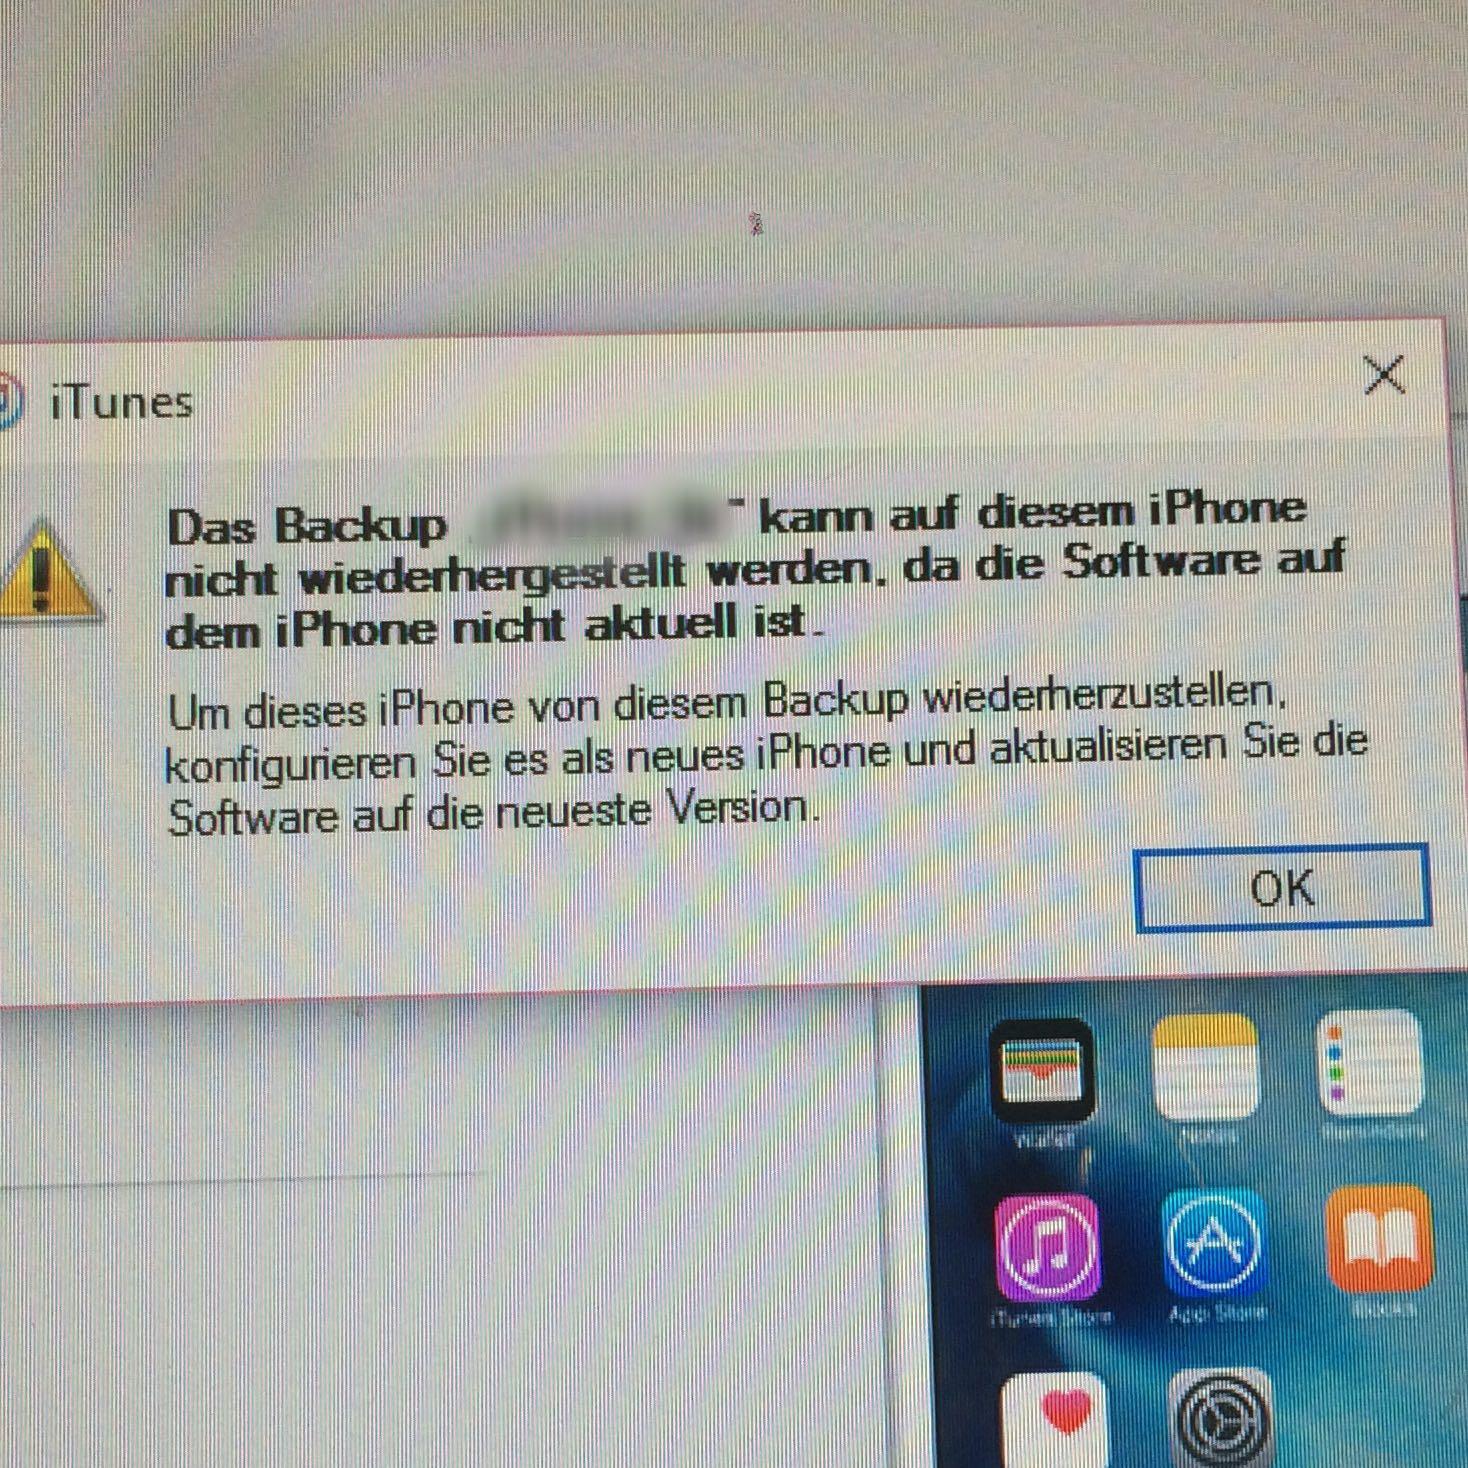 Neues iphone bei itunes anmelden